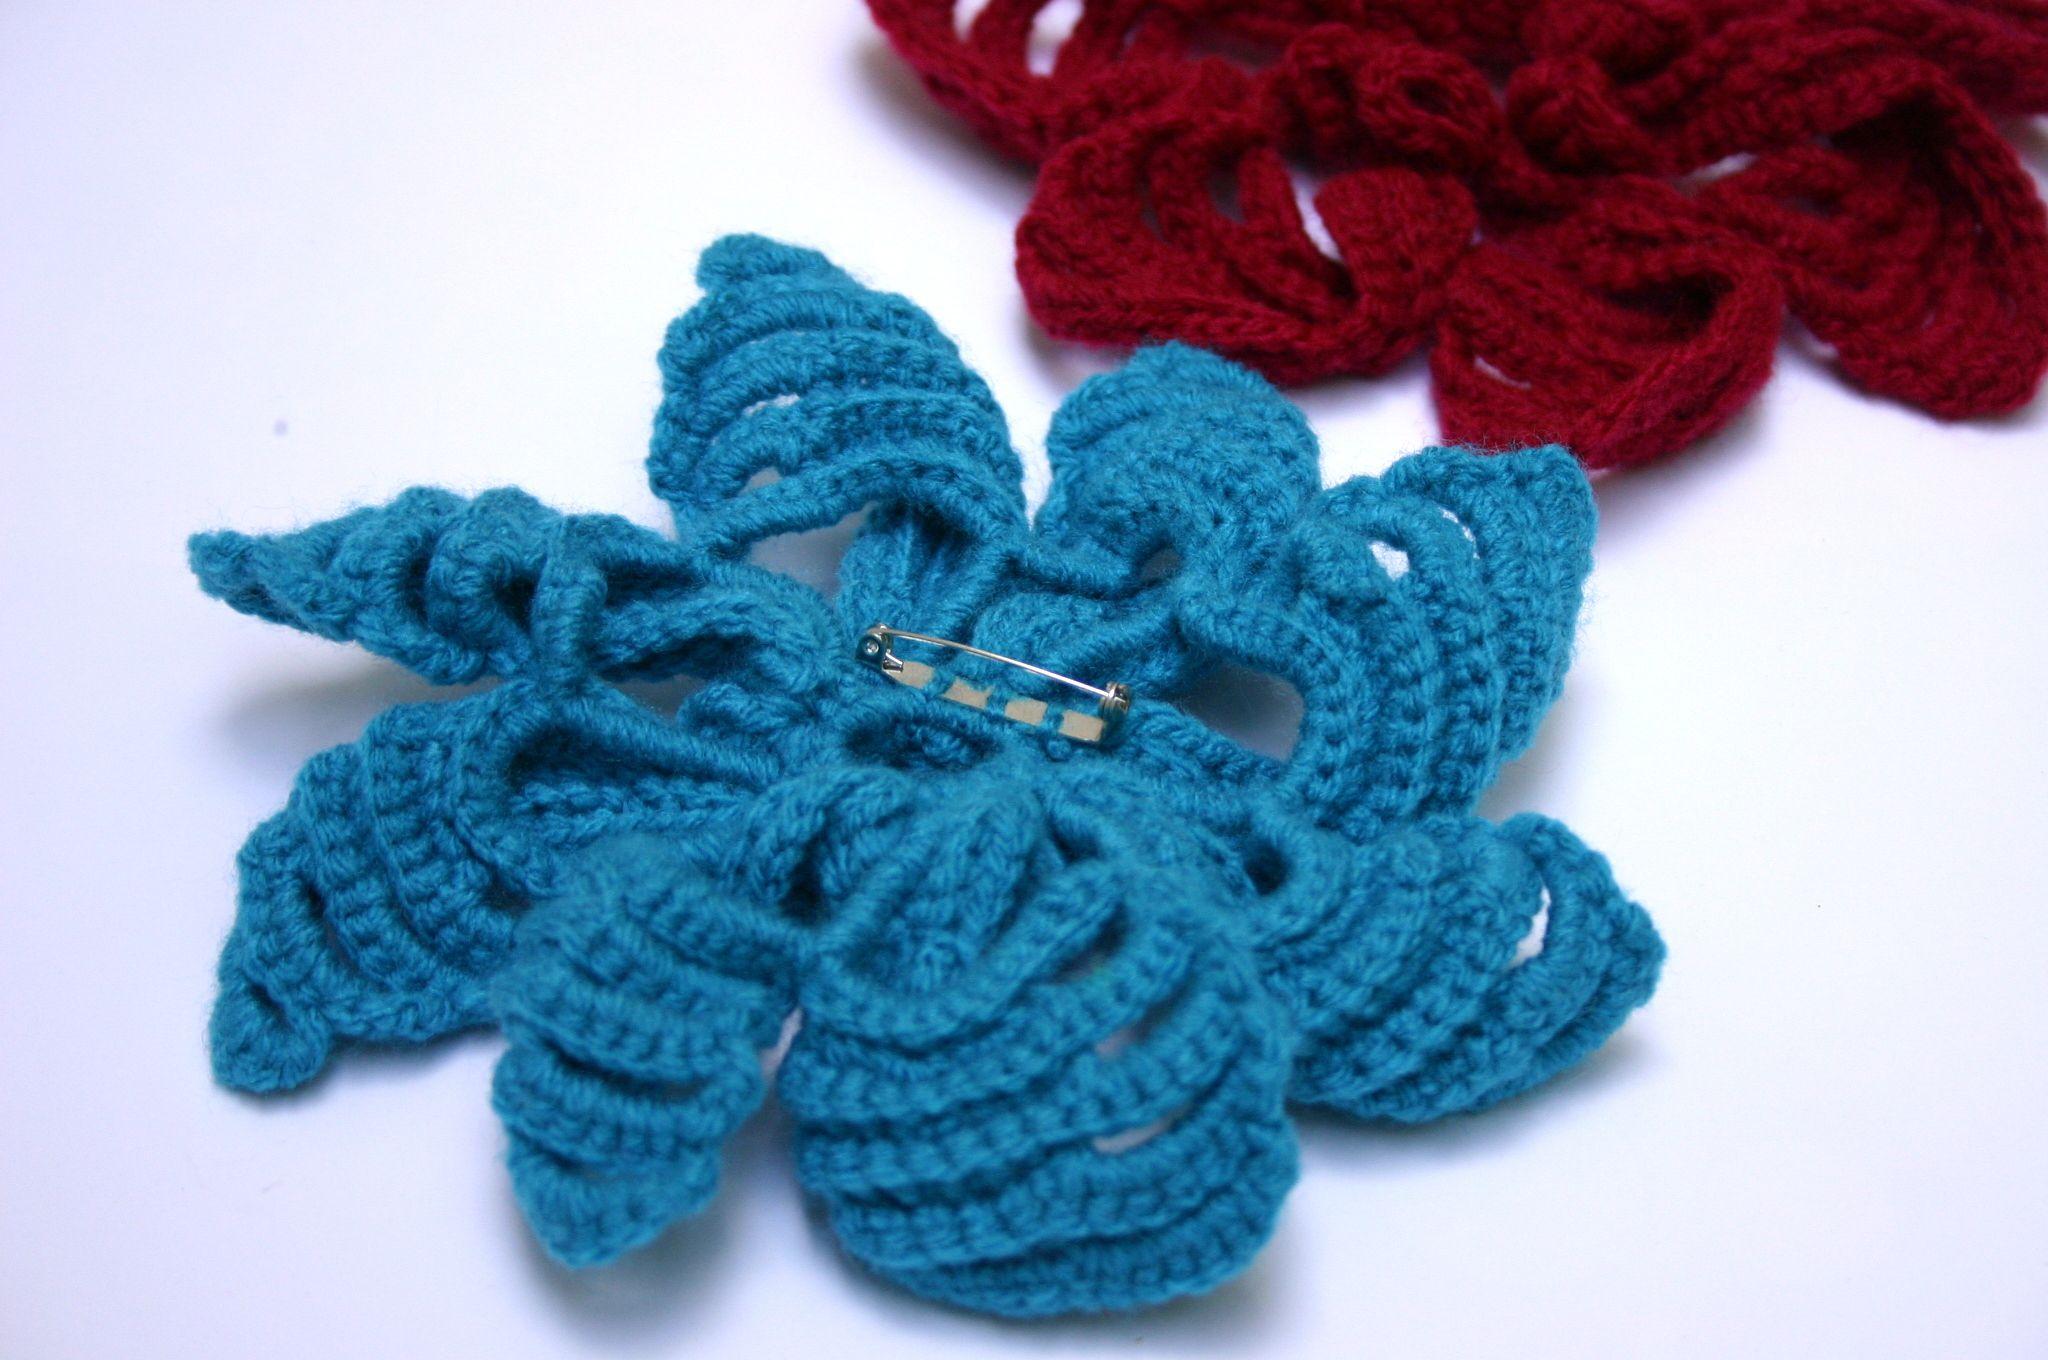 patches casual brooch boho crochet pins jewelry pattern yarn handmade lace flower pinback